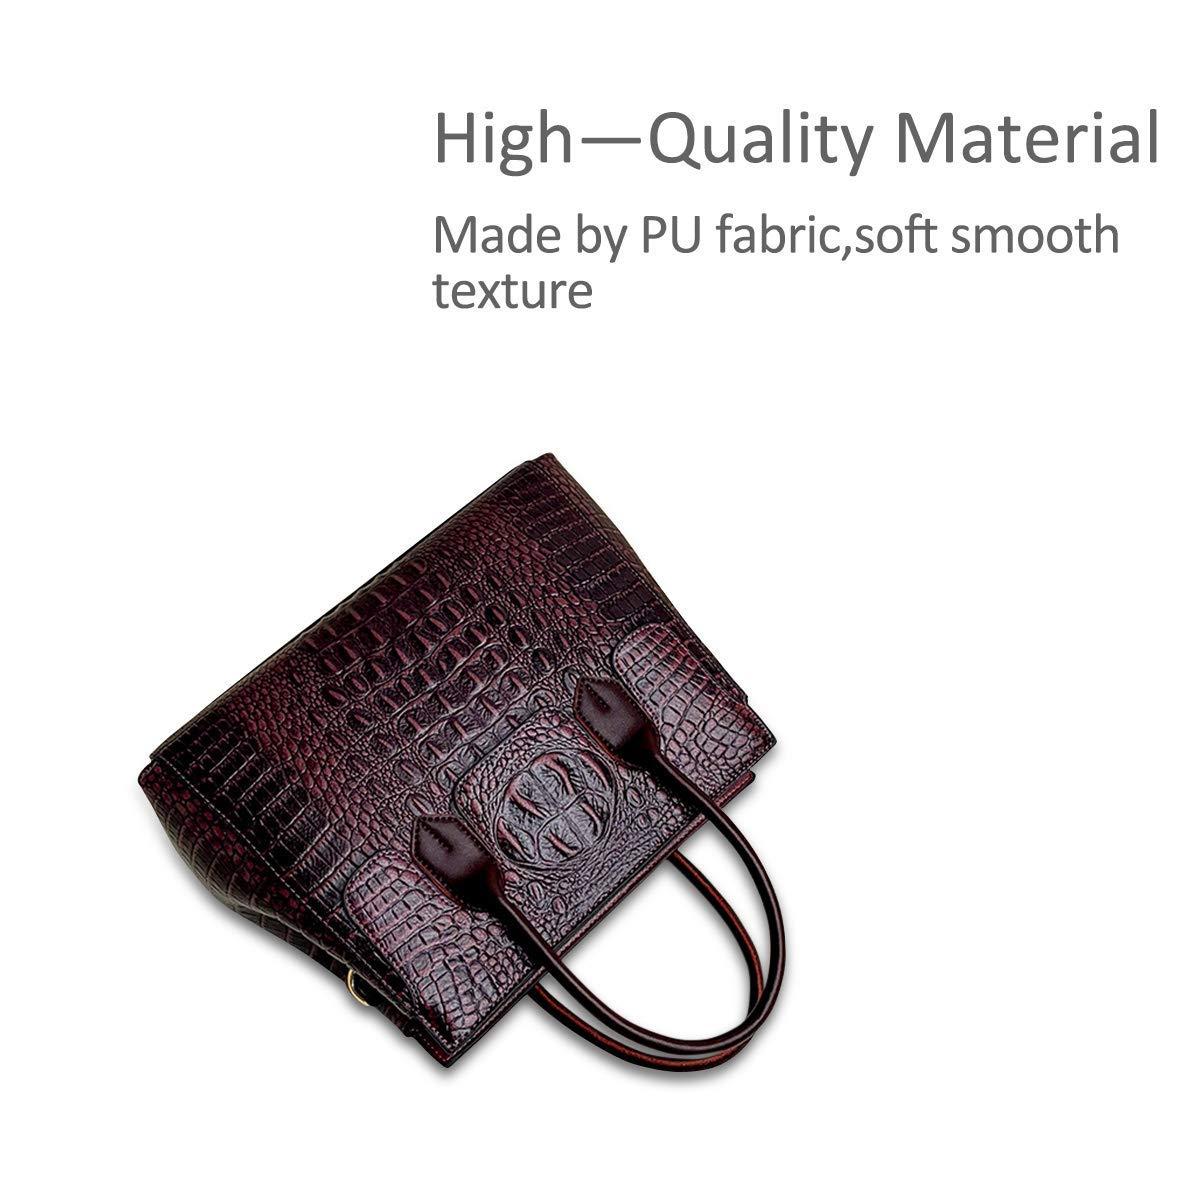 Taschen Handtaschen Designer Taschen Krokodil Top umhängetasche luxuriöse Ledertasche Ledertasche Ledertasche Damen PU Leder(Maulbeere) B07PWXS9VD Umhngetaschen Geschwindigkeitsrückerstattung 0e5e47